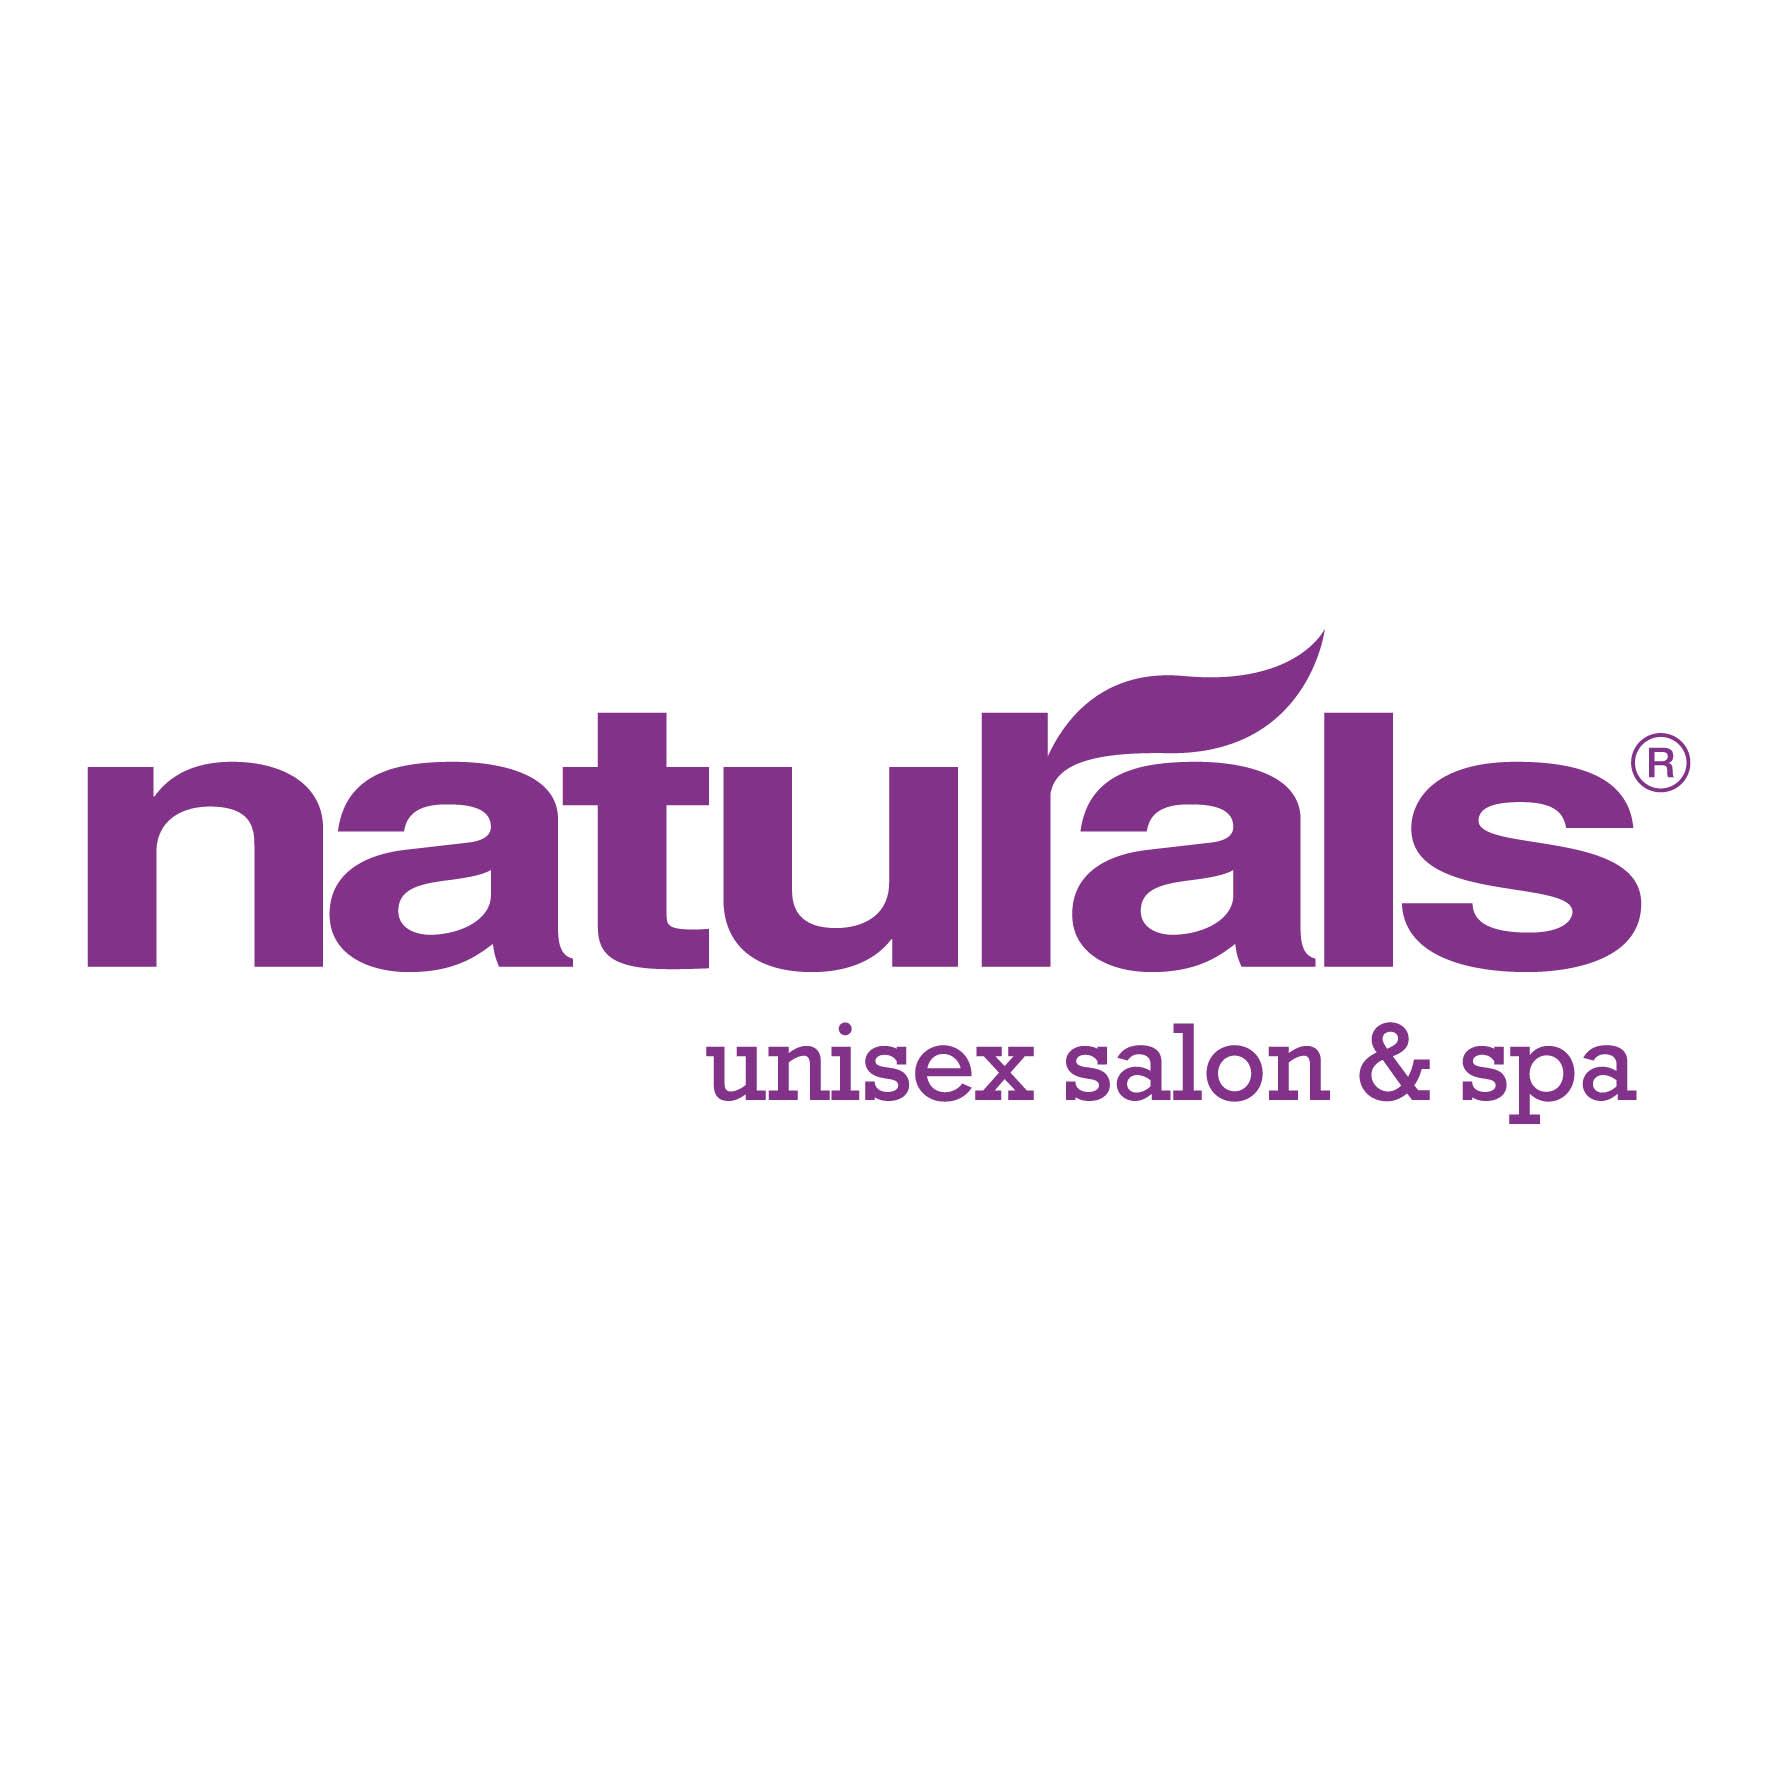 Naturals Family Salon Spa - Vijayanagar - Bangalore Image